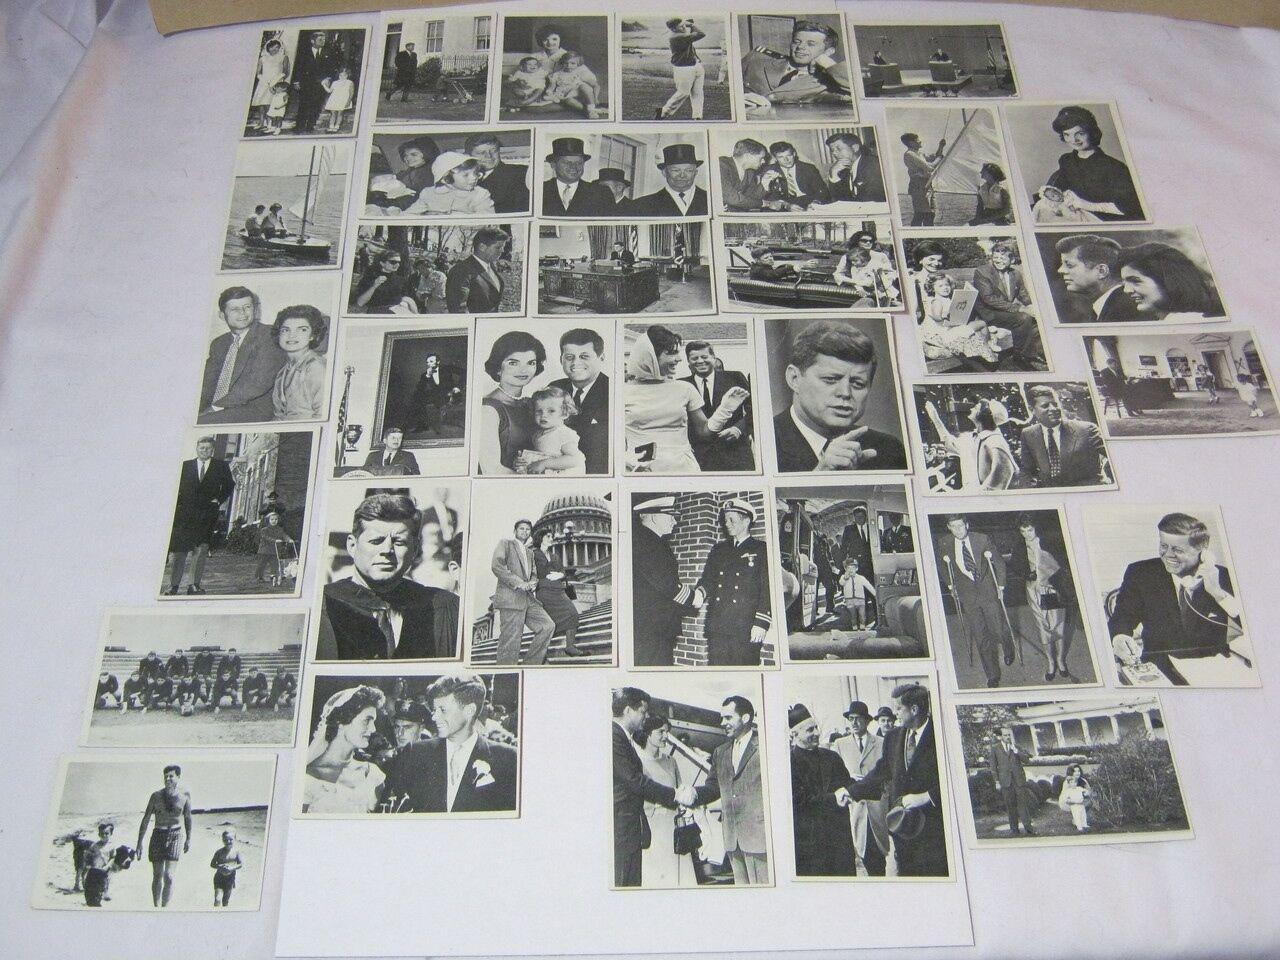 John F. Kennedy Topps JFK Trading Cards Lot of 37 1960's Vintage  T